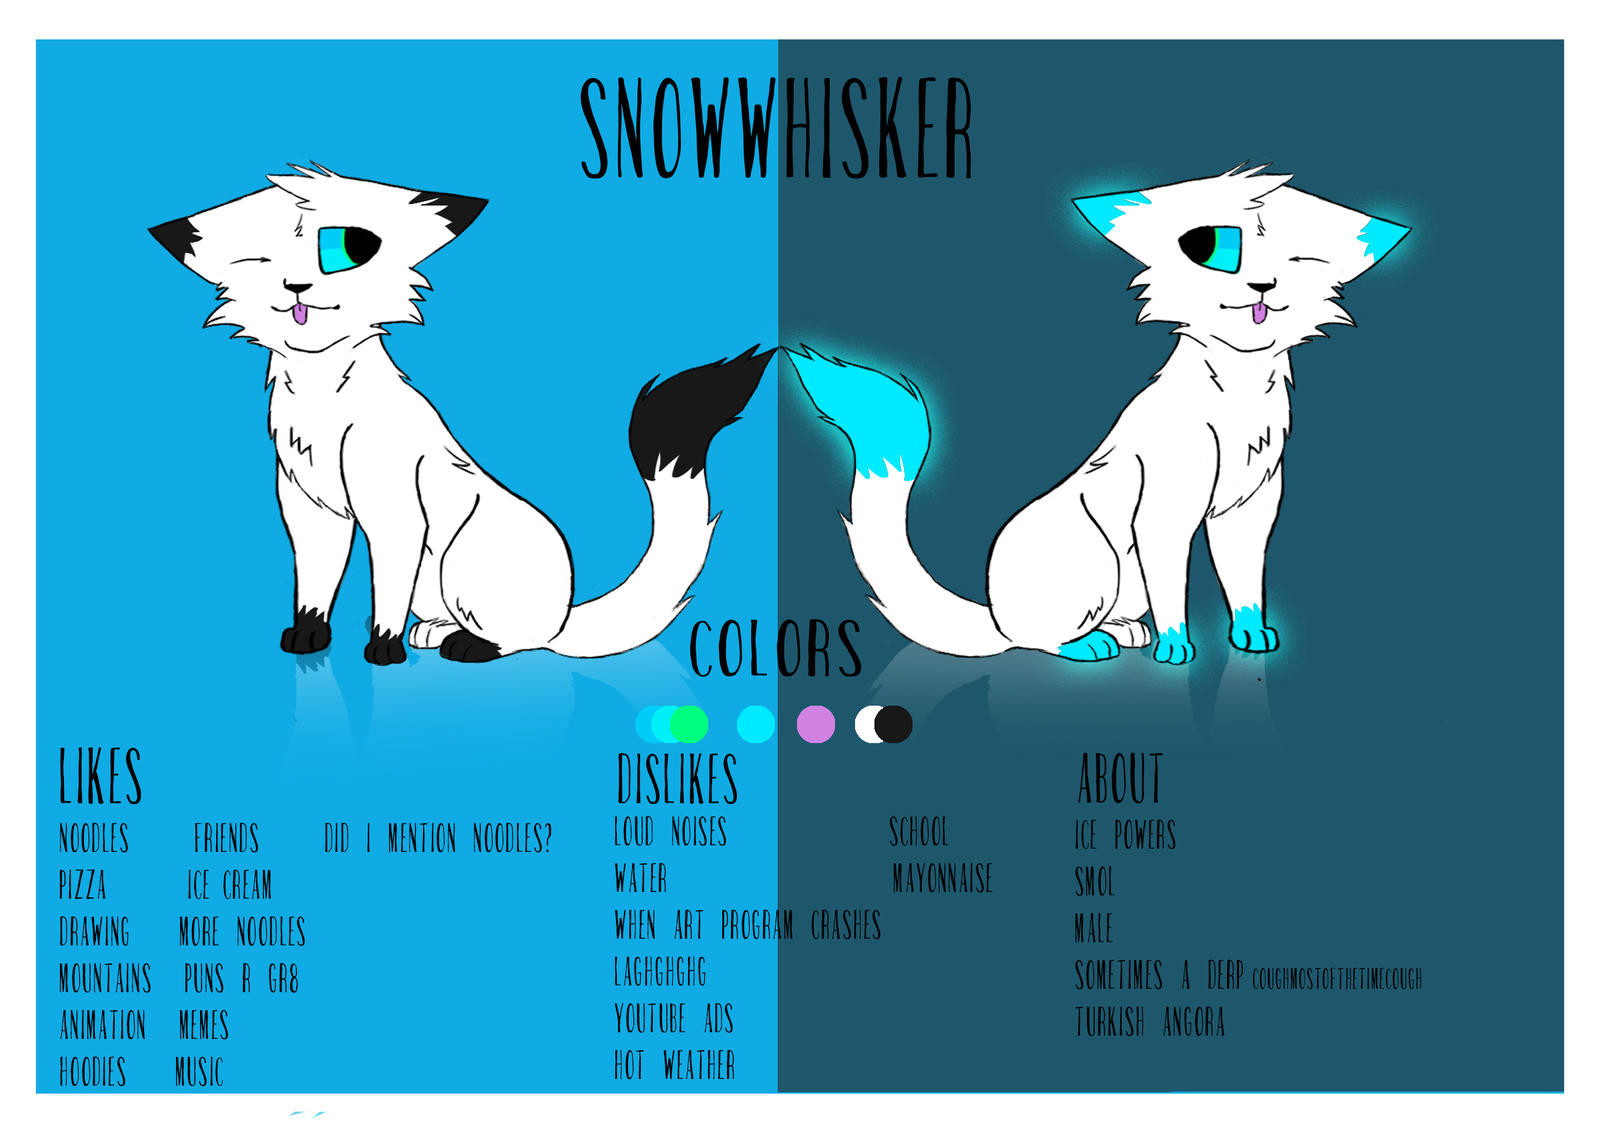 Snowwhisker Ref August 2016 by SnowWhisker4